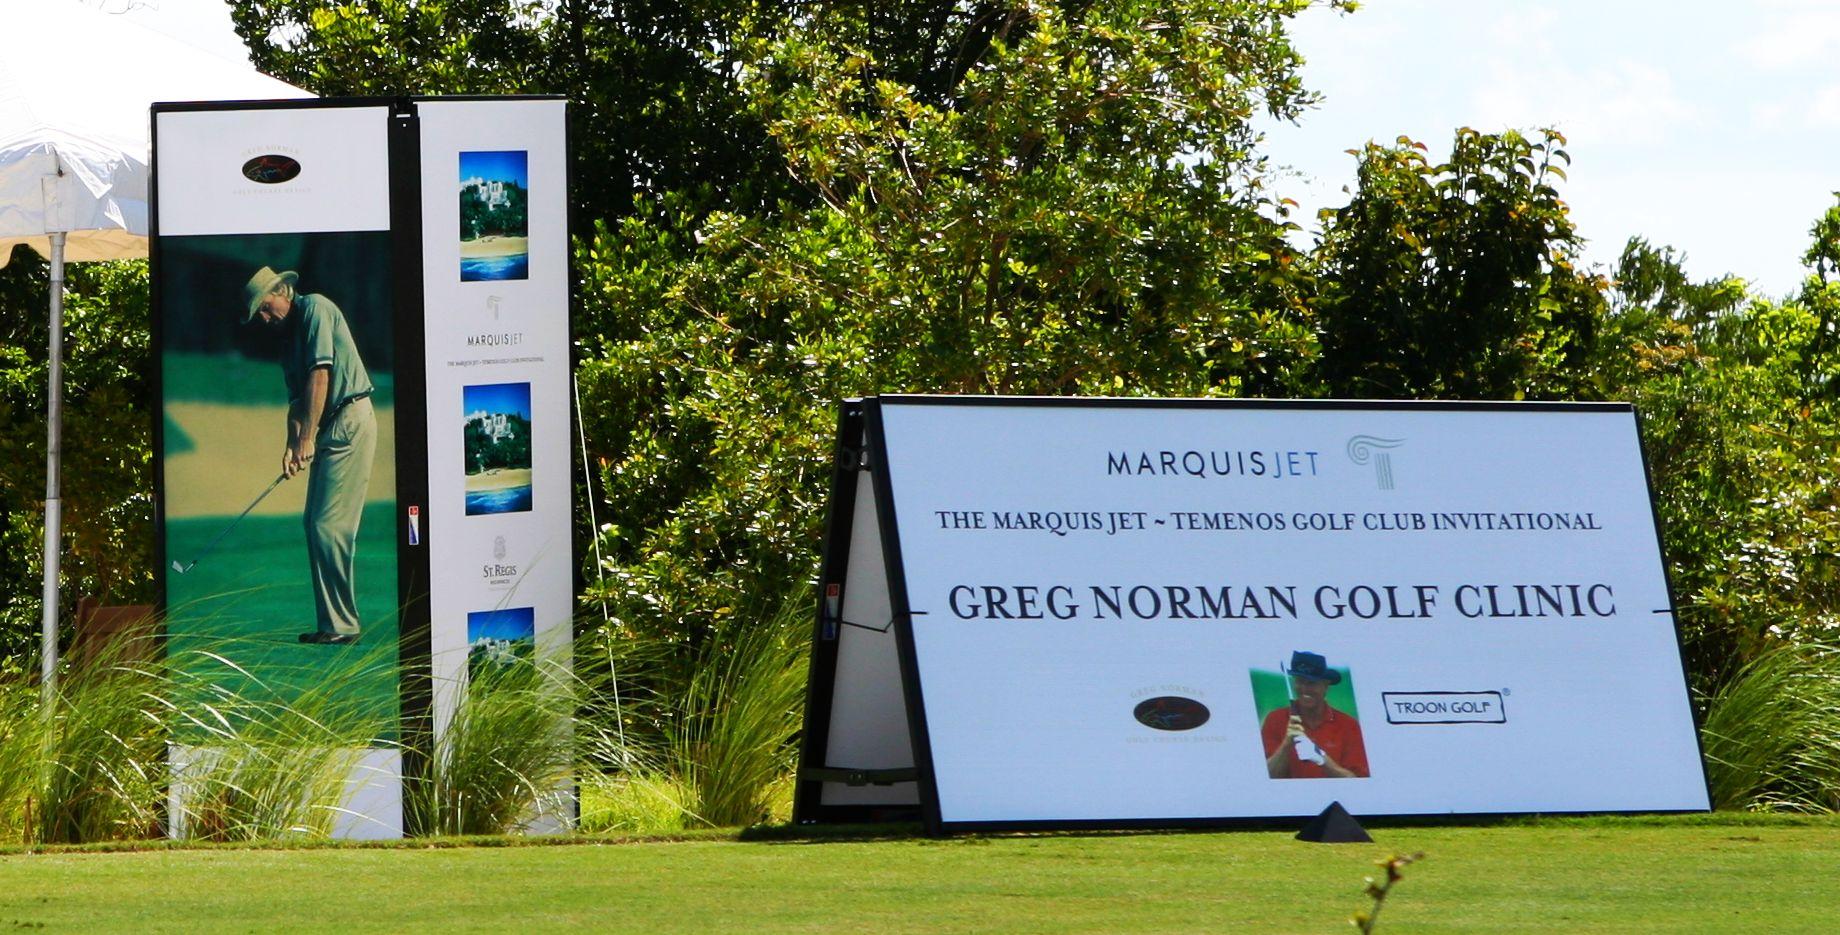 Greg Norman Golf Clinic - SSS Towers & Walls